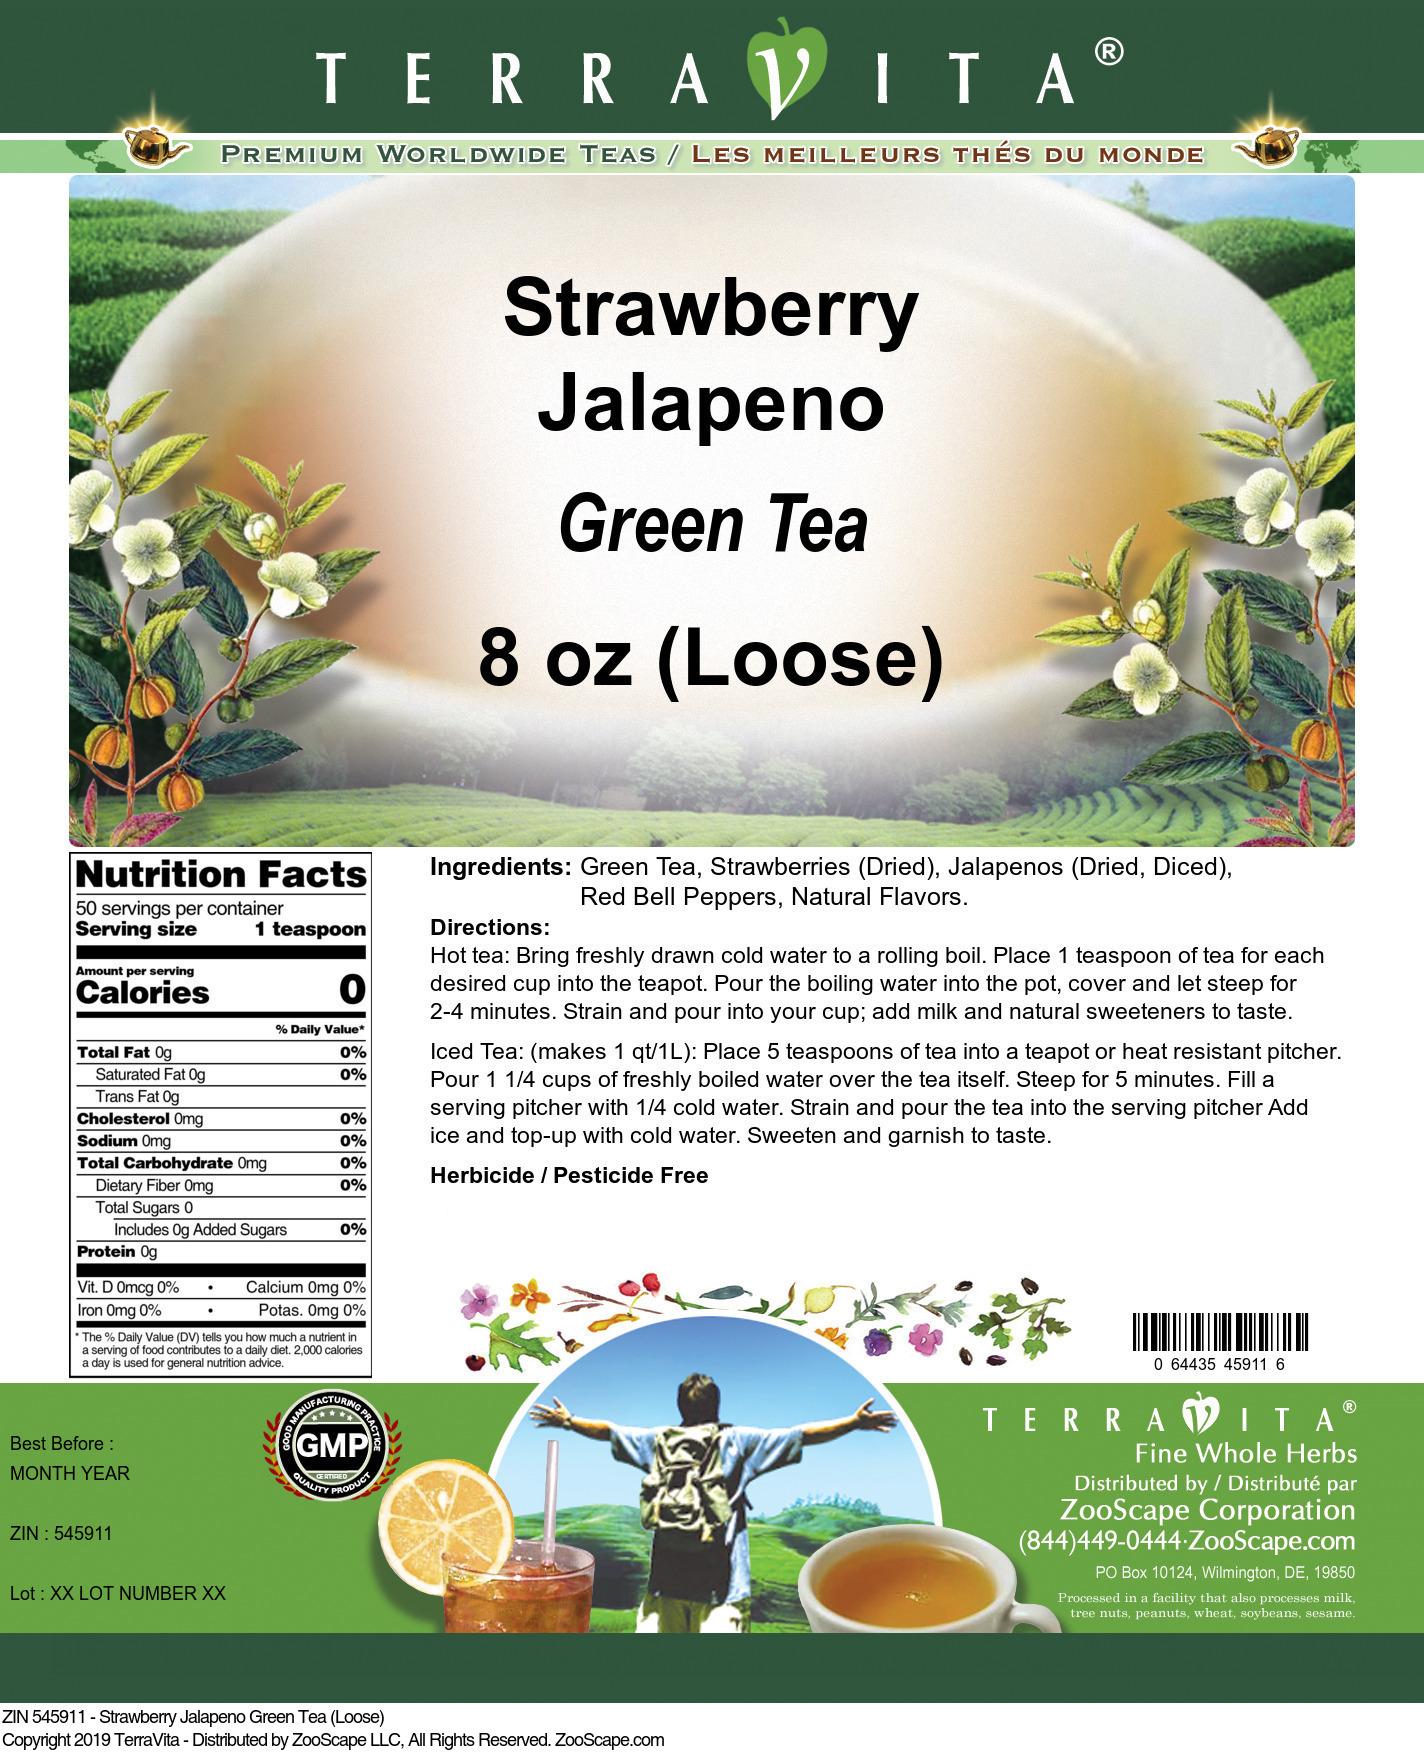 Strawberry Jalapeno Green Tea (Loose)